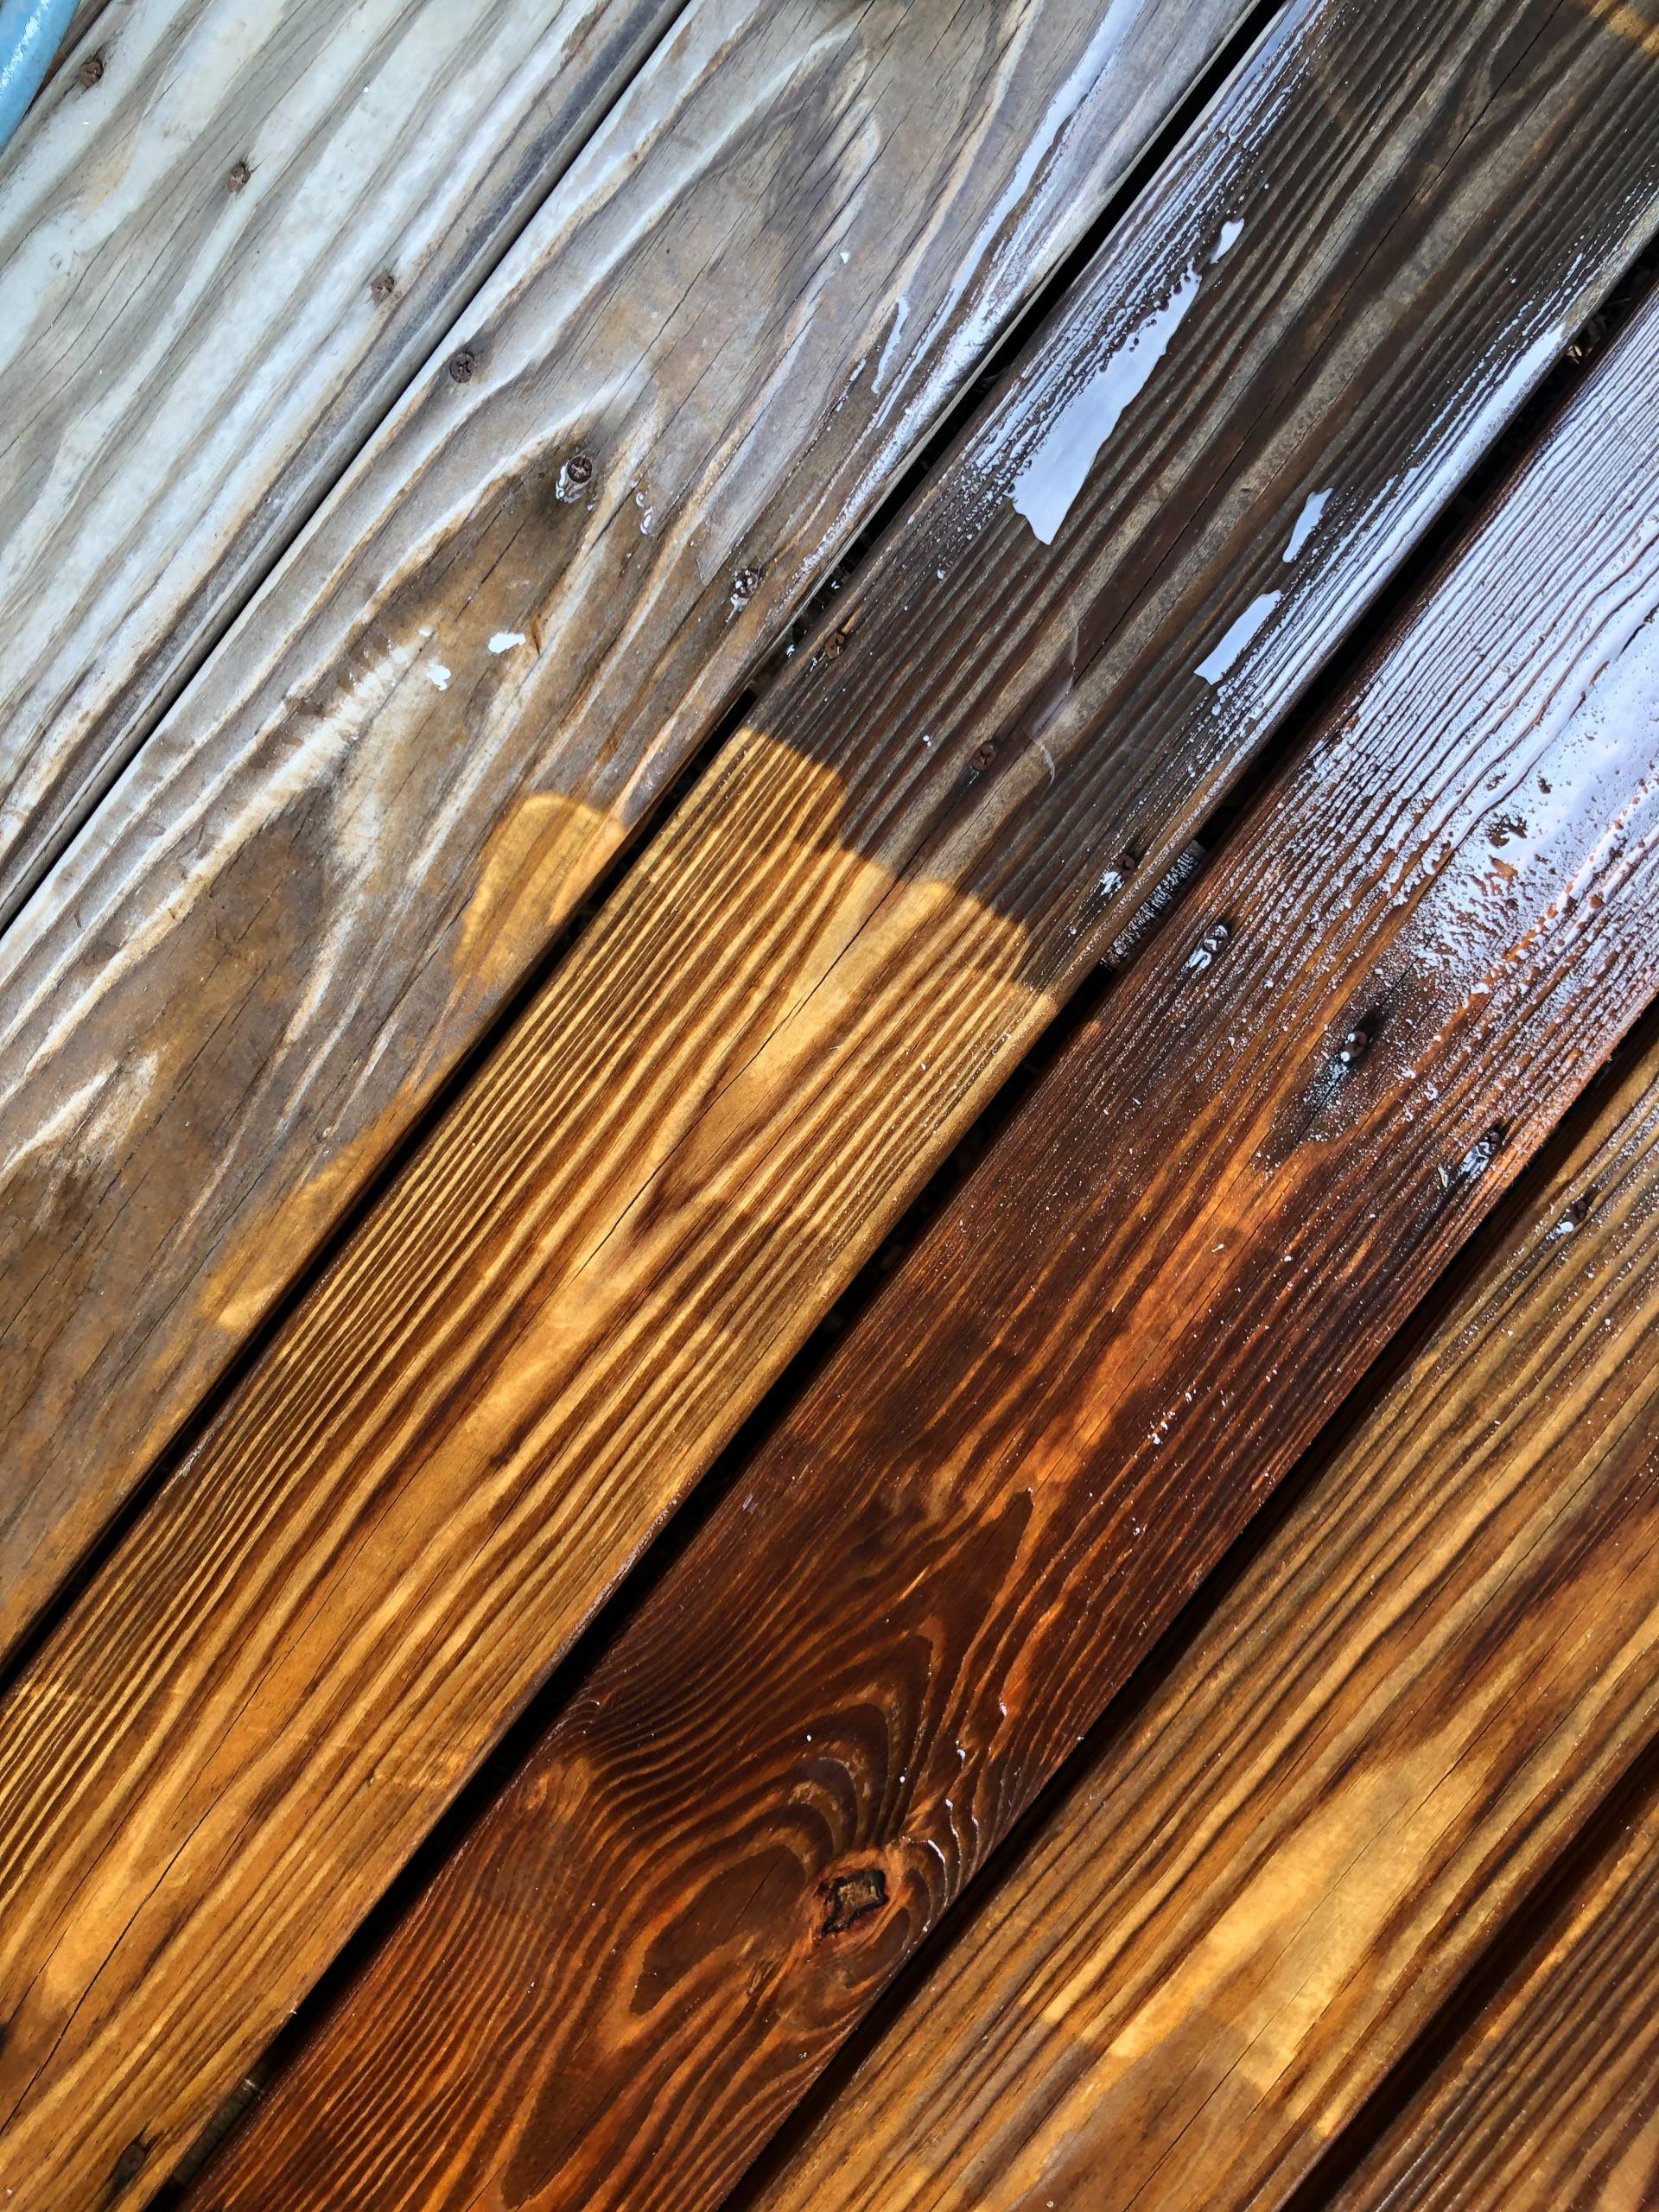 pressure washing wood porch